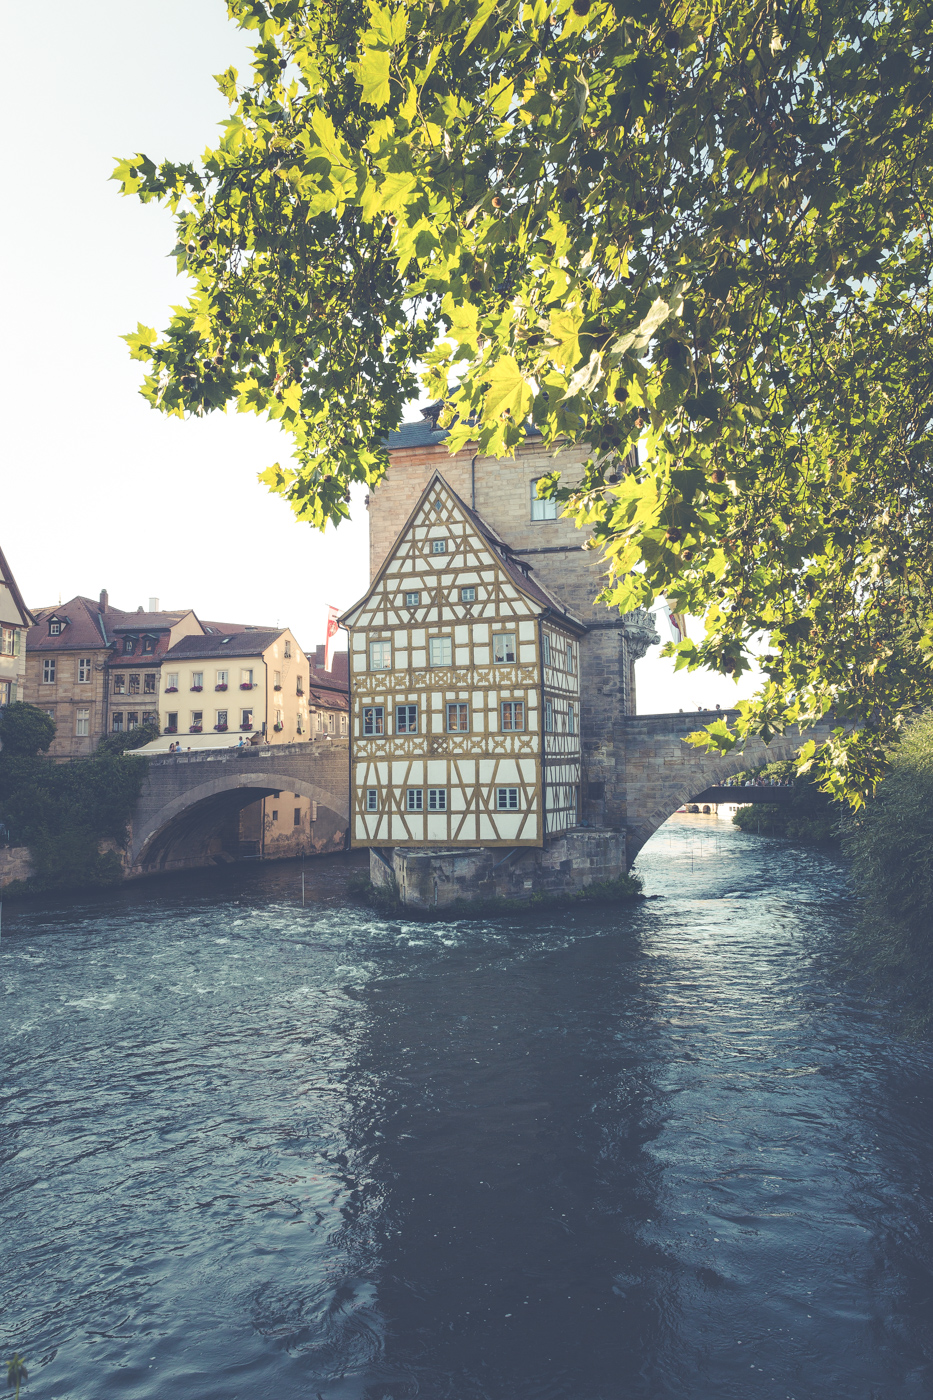 Altes Rathaus Bamberg UNESCO Weltkulturerbe